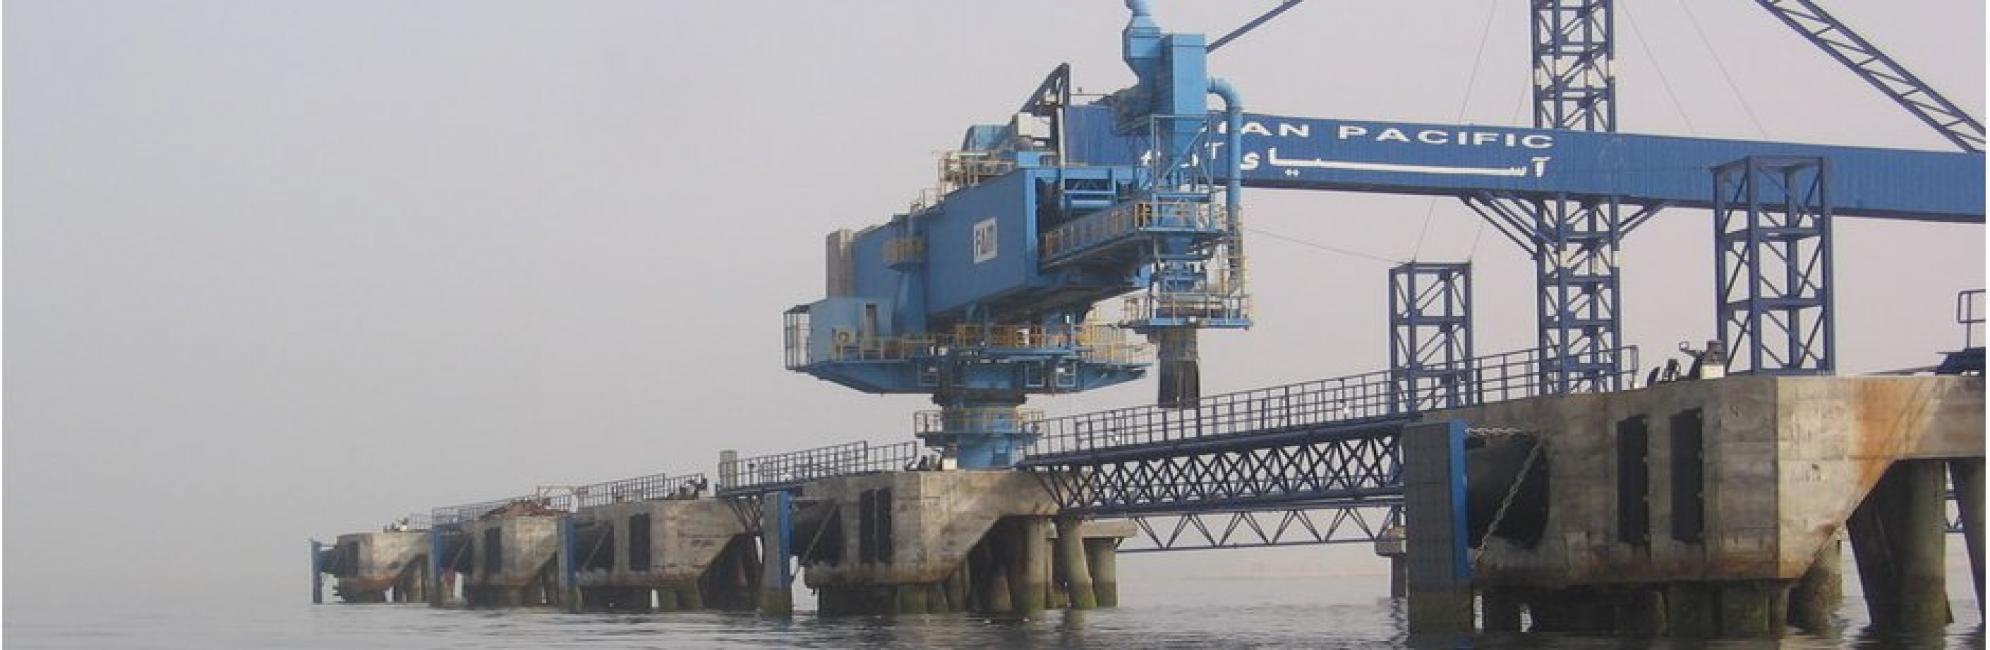 Sarooj  50,000 DWT Berth, Shiploader 1200 Ton/hr, Conveyor  Kangan, Busher Province